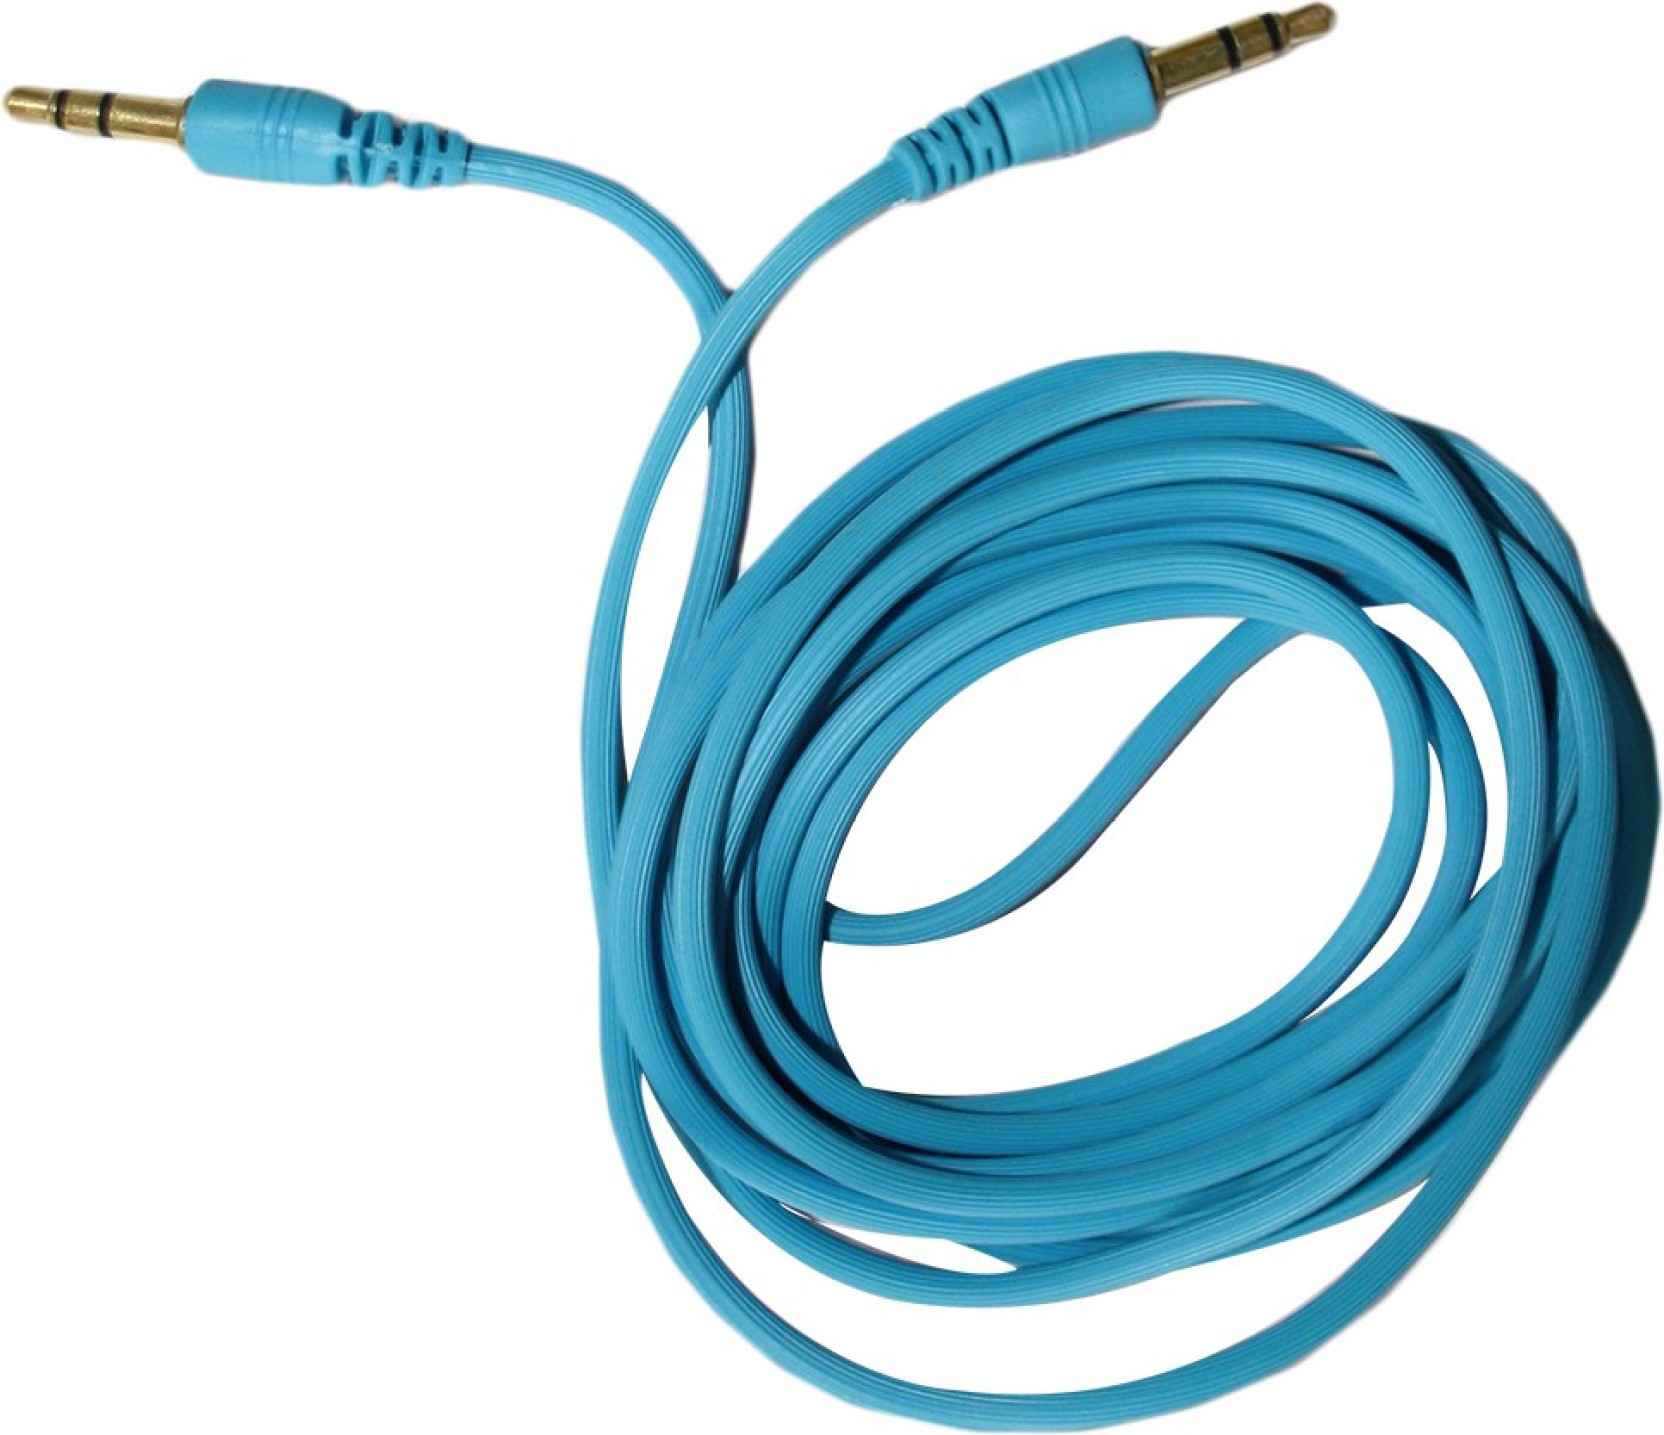 MAK 2m Blue AUX Cable - MAK : Flipkart.com